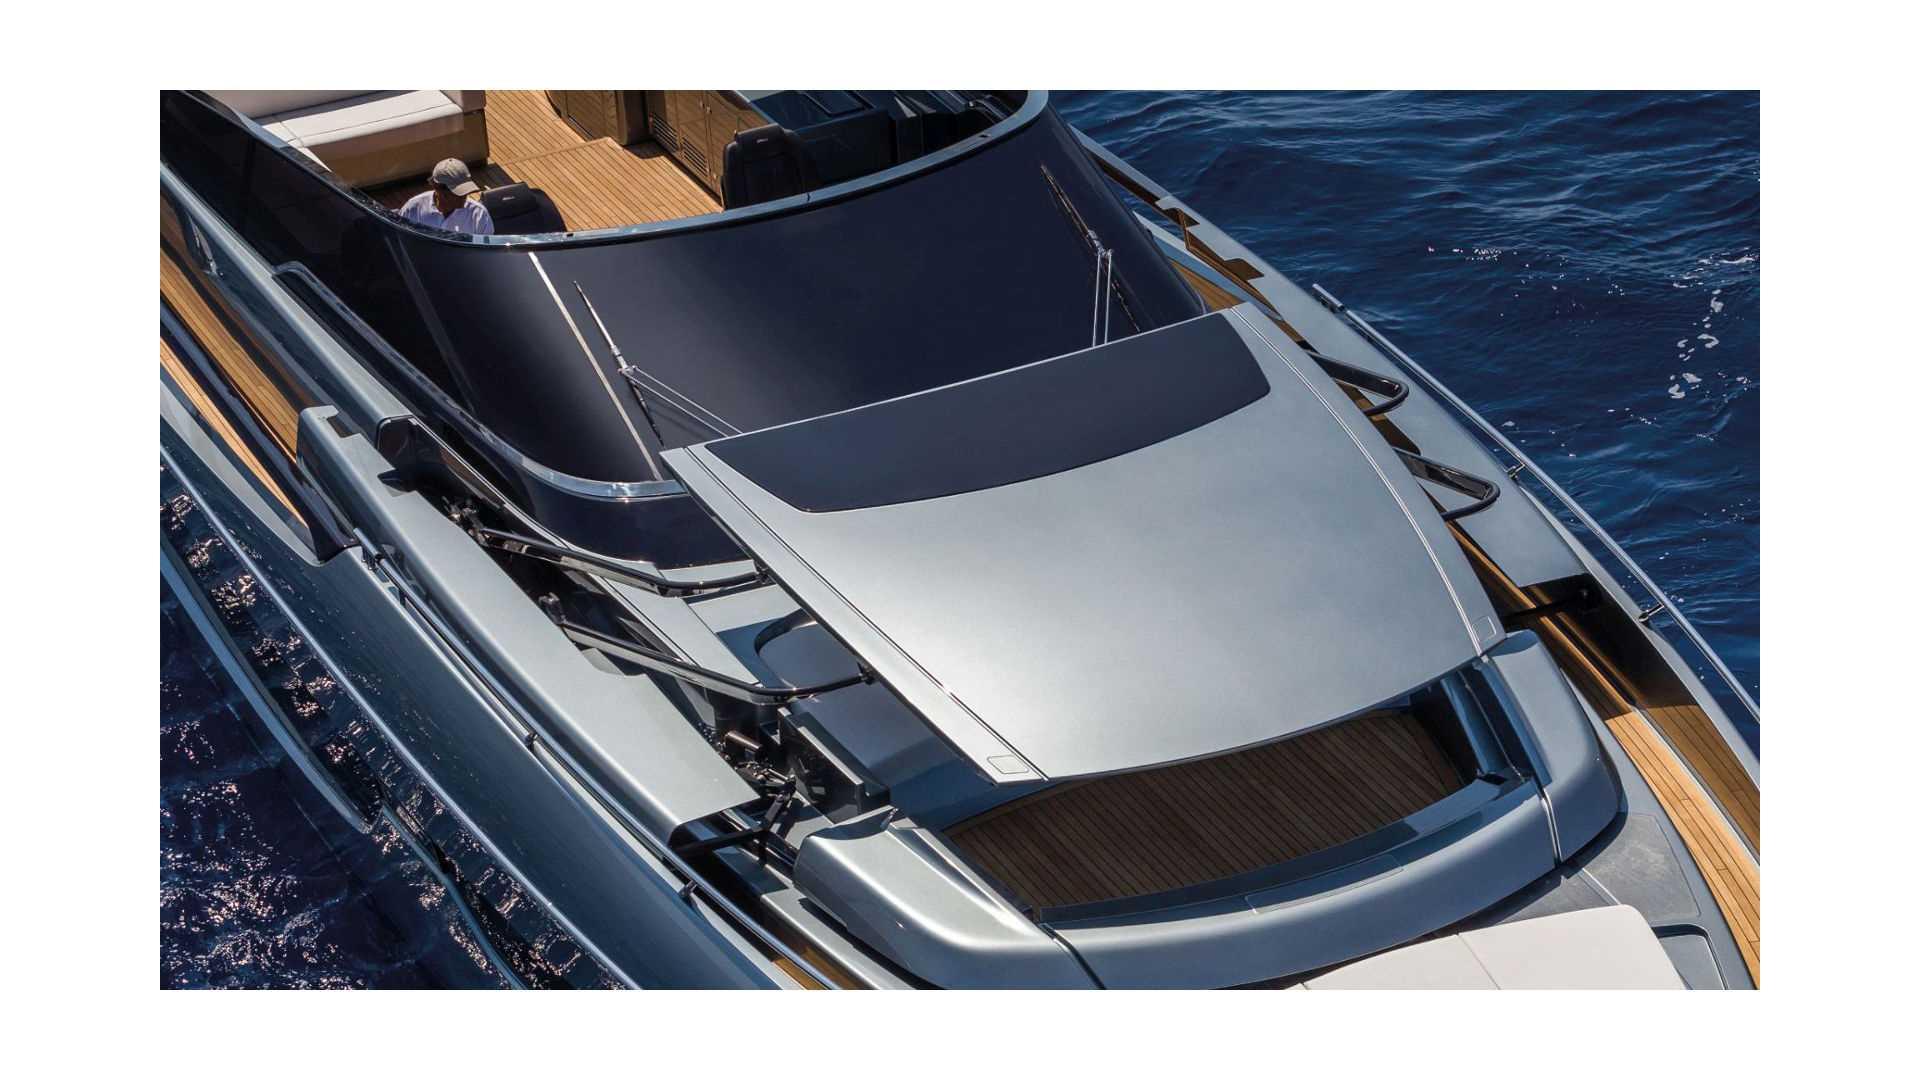 179911 yacht charter superyacht news Riva motors